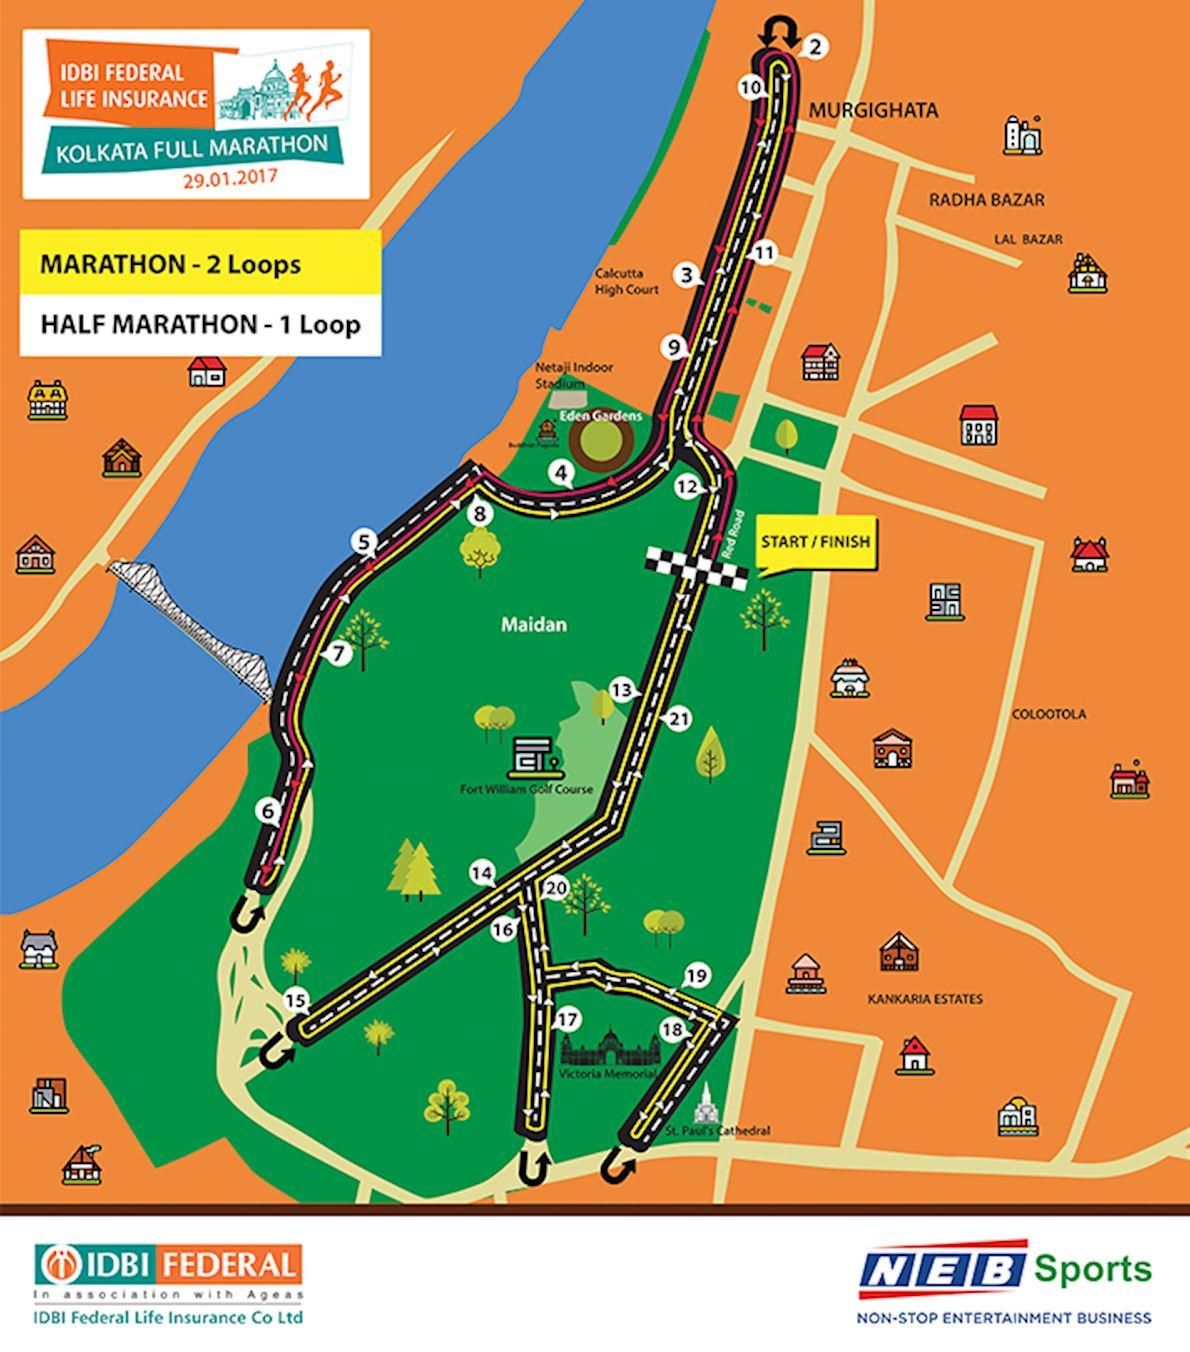 IDBI Kolkata Marathon Route Map